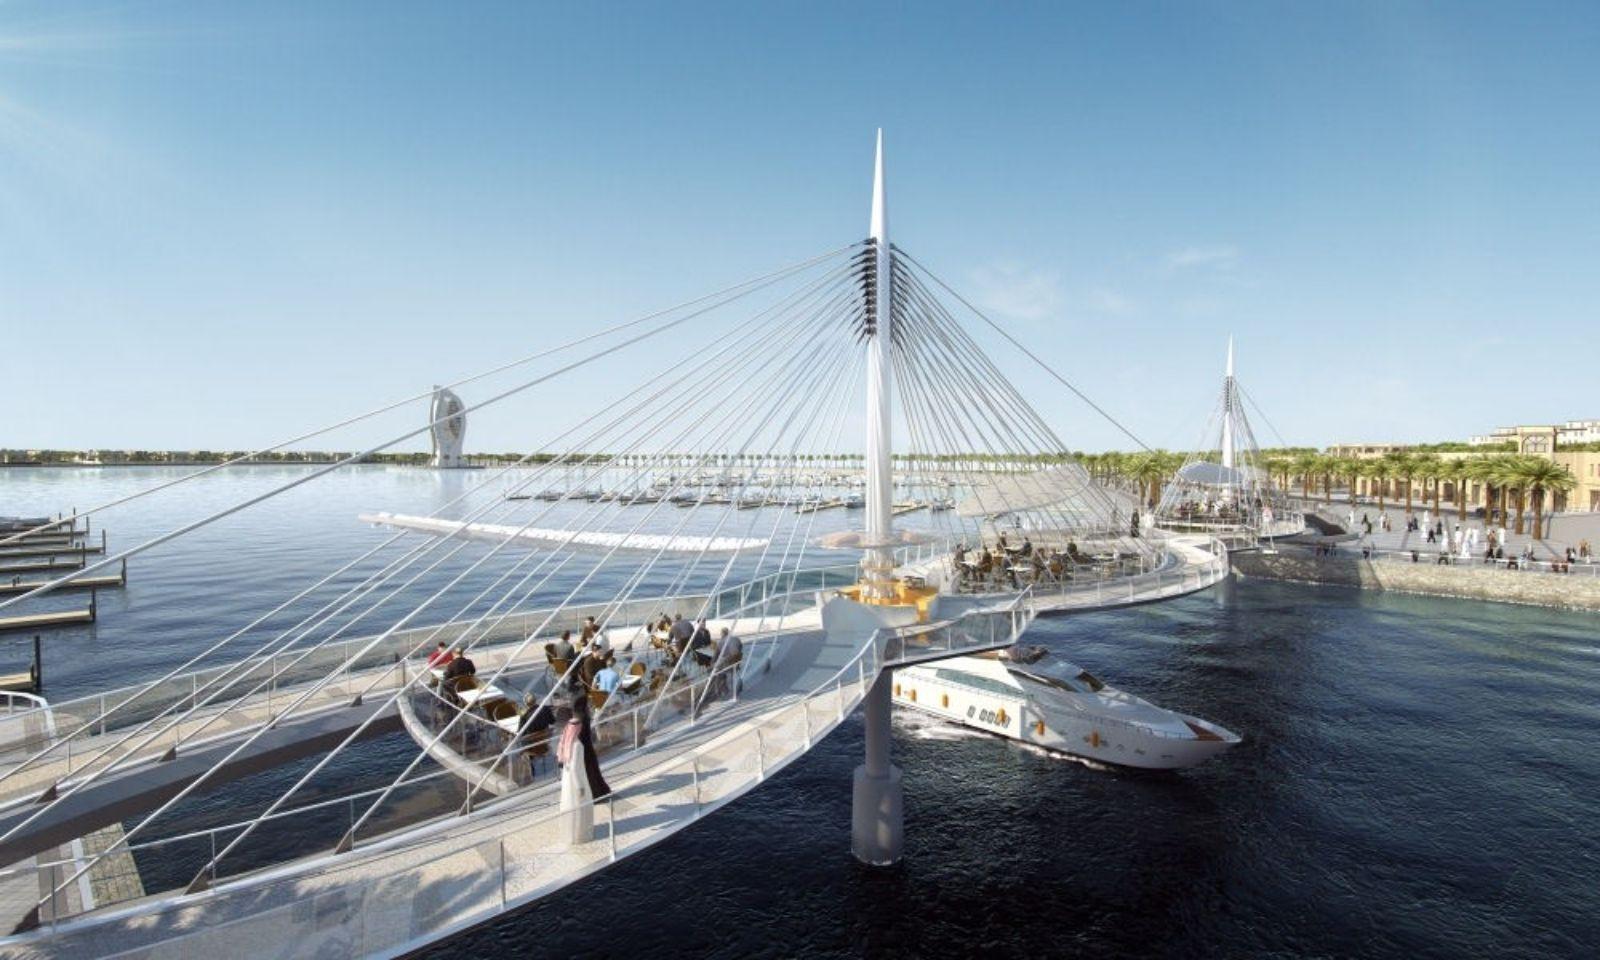 Lusail-Pedestrian-Bridges-by-Safdie-Rabines-Architects-03.jpg